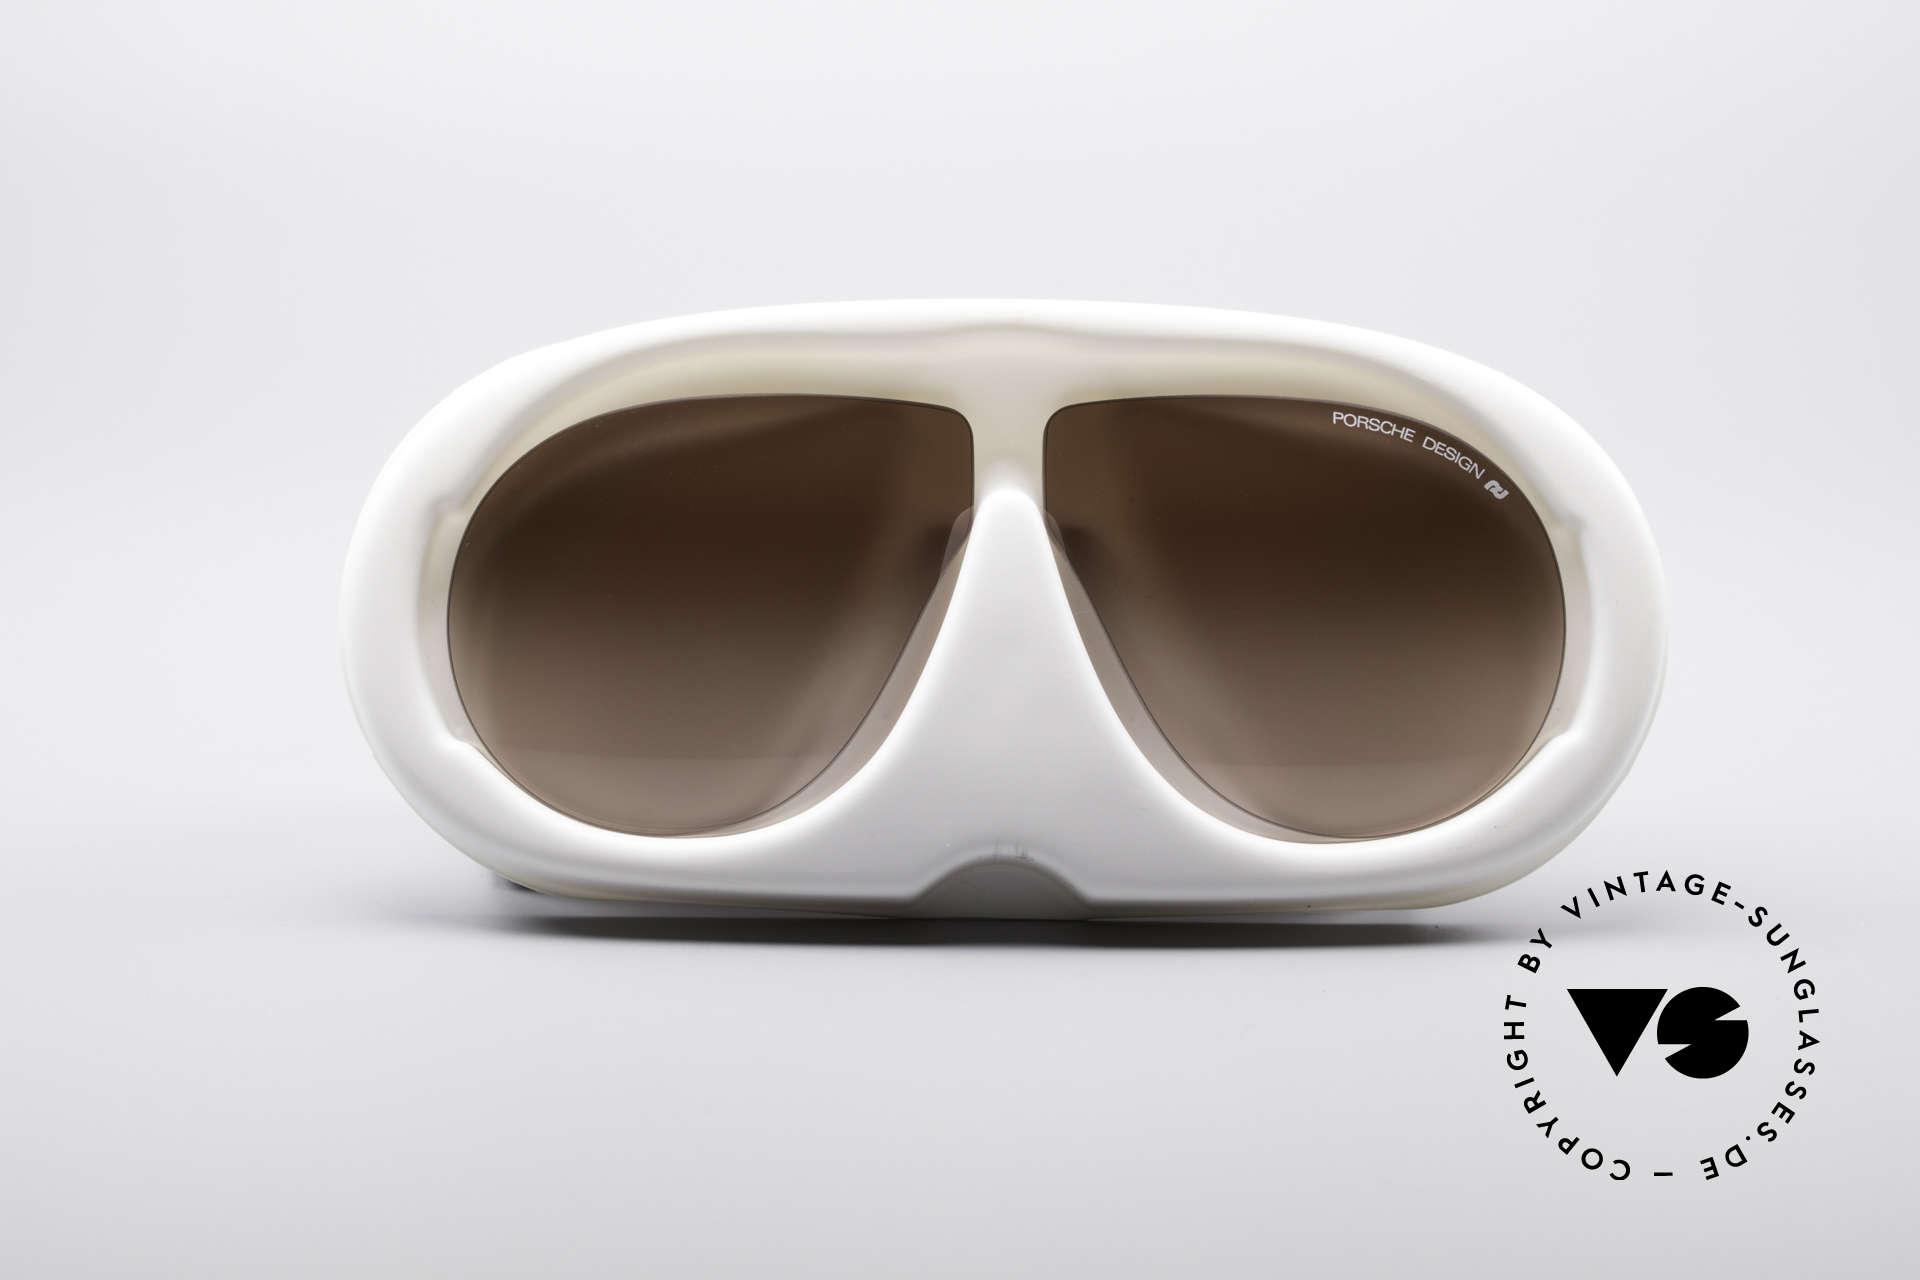 Porsche 5628 Lenses 80's Folding Sunglasses, sun lenses for the old Porsche 5628 folding shades, Made for Men and Women